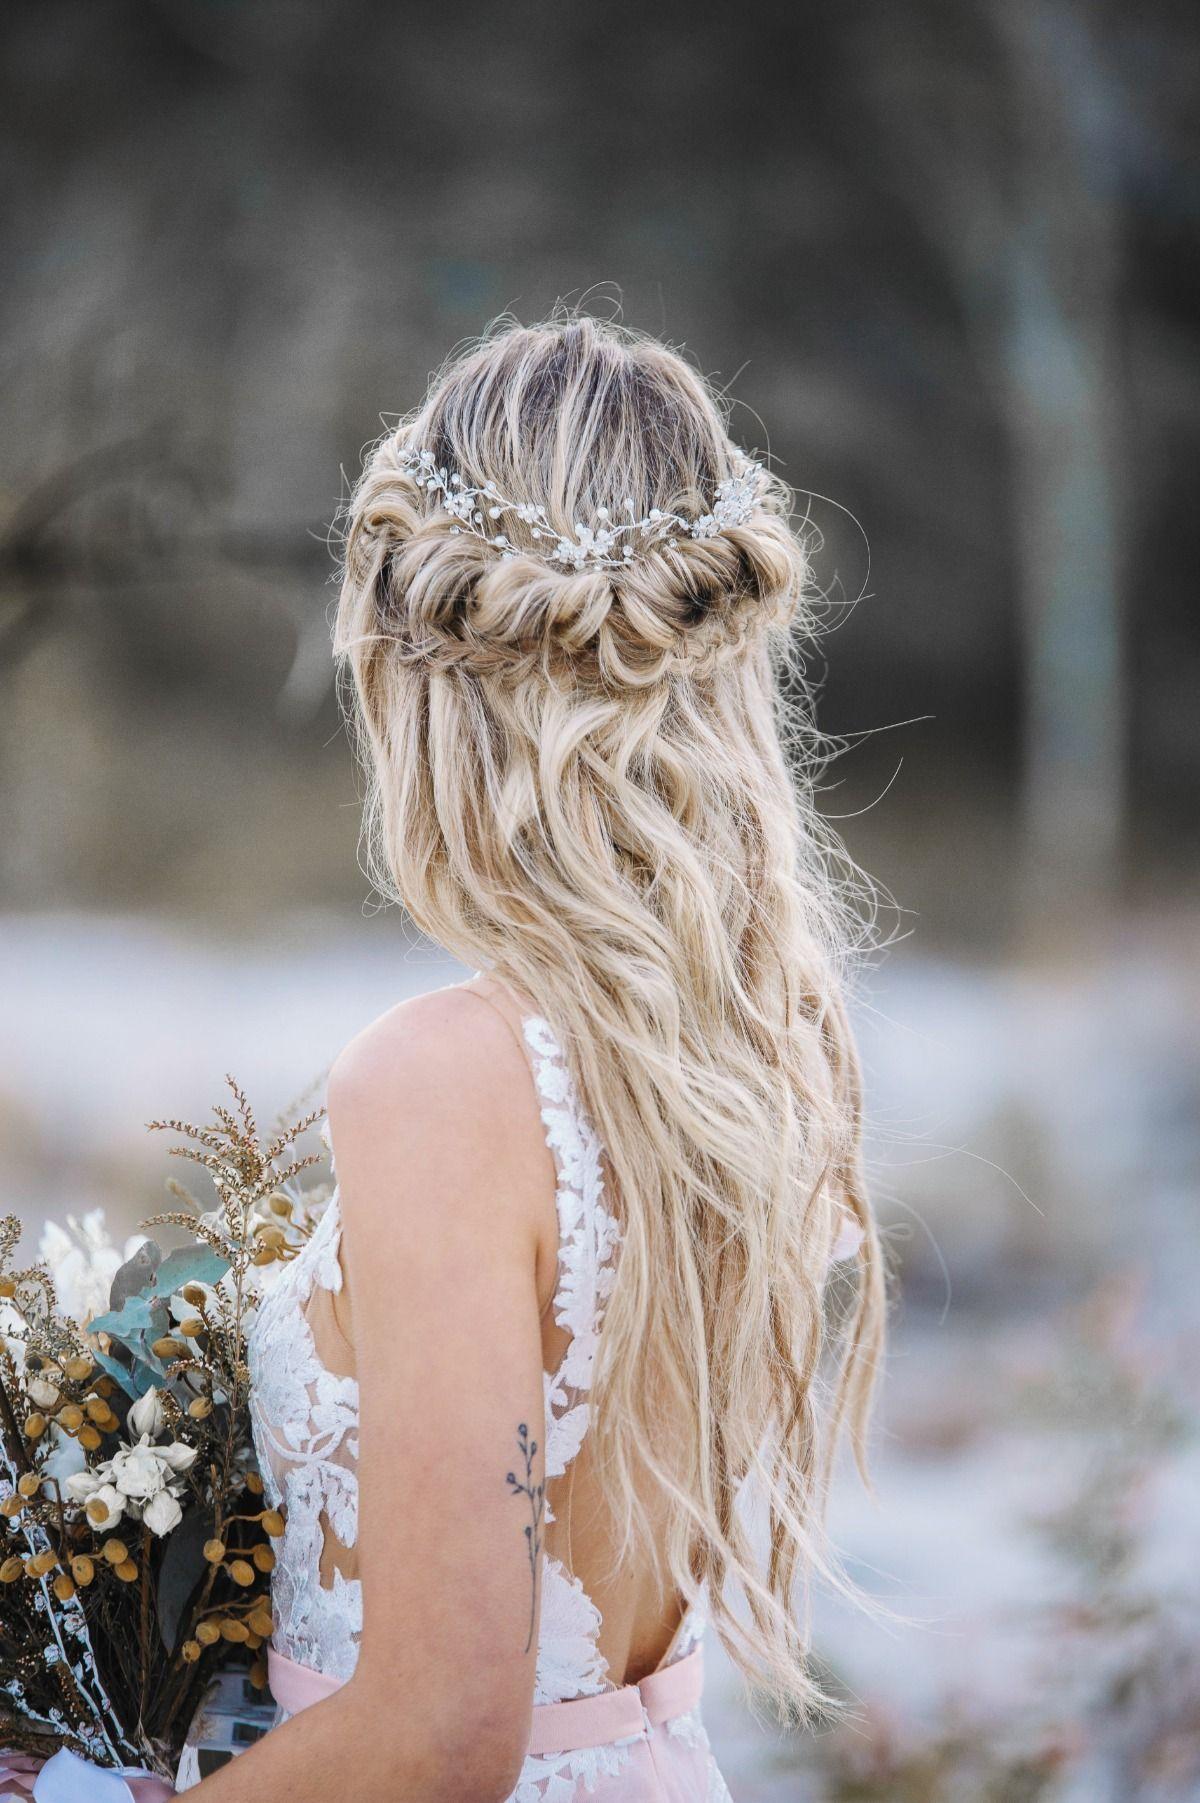 Winter Bridal Looks You Can't Help But Love Bride mermaid hair